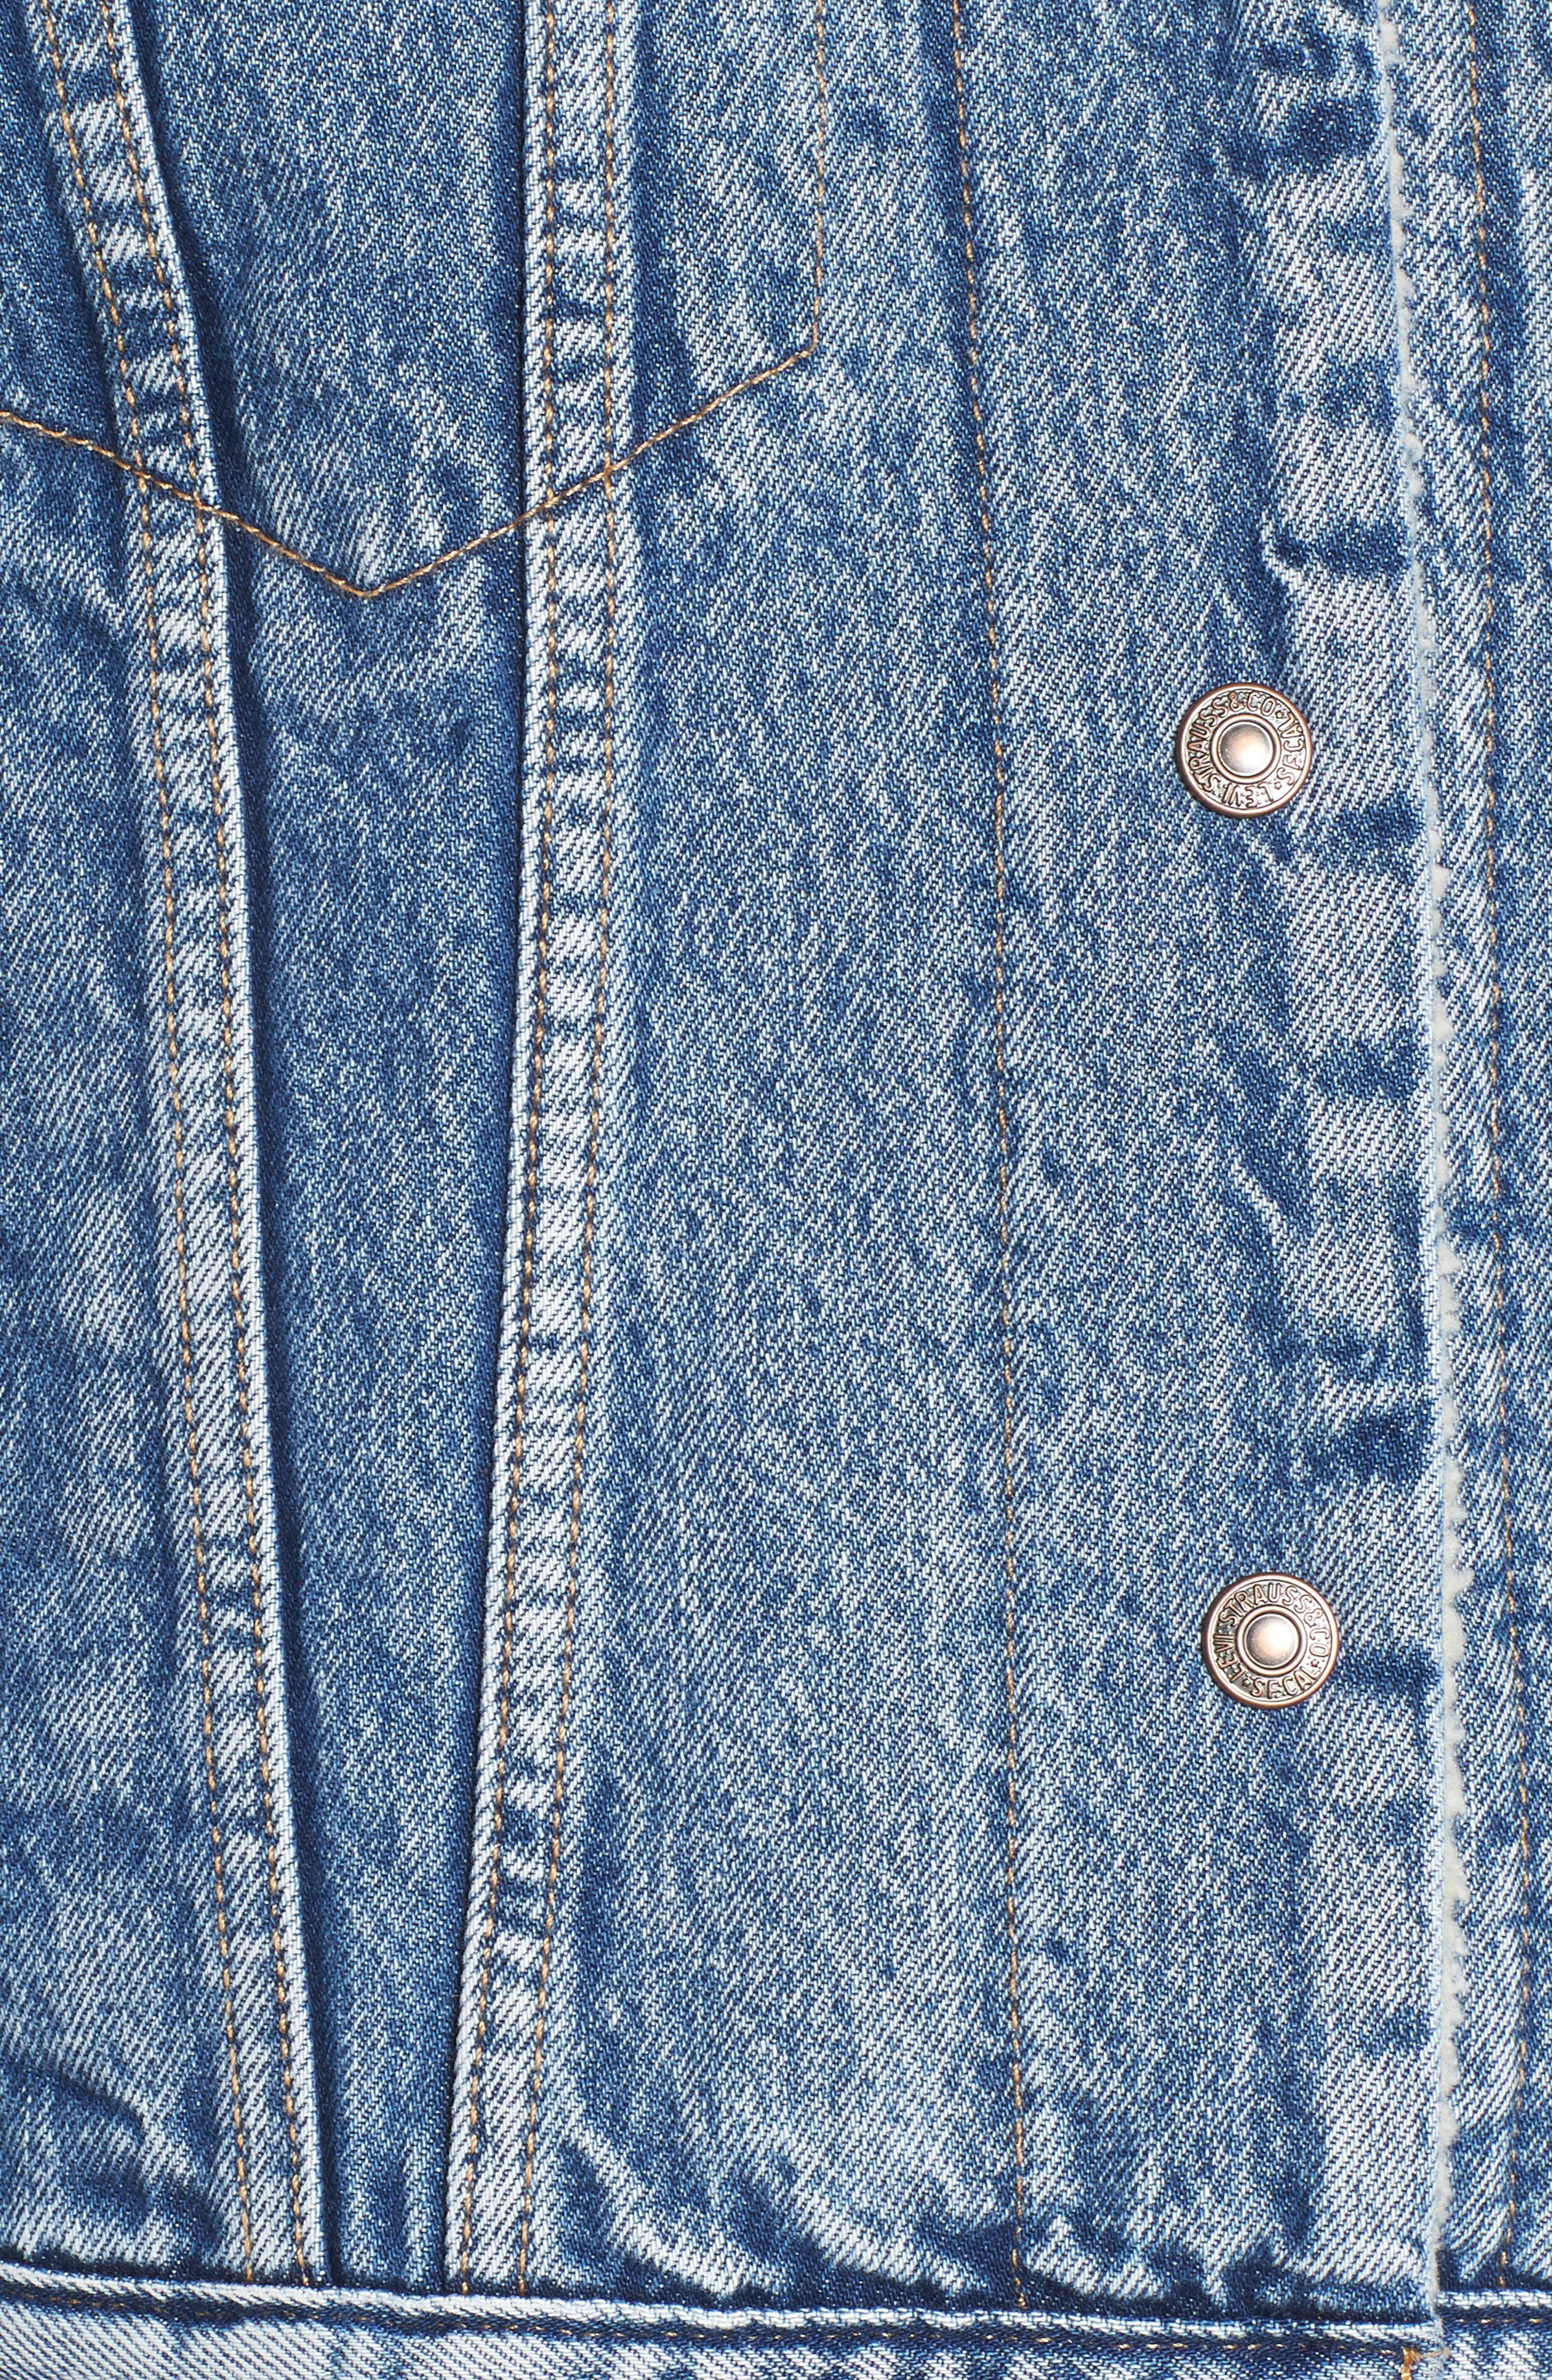 Ex-Boyfriend Fleece Lined Denim Jacket,                             Alternate thumbnail 7, color,                             ADDICTED TO LOVE